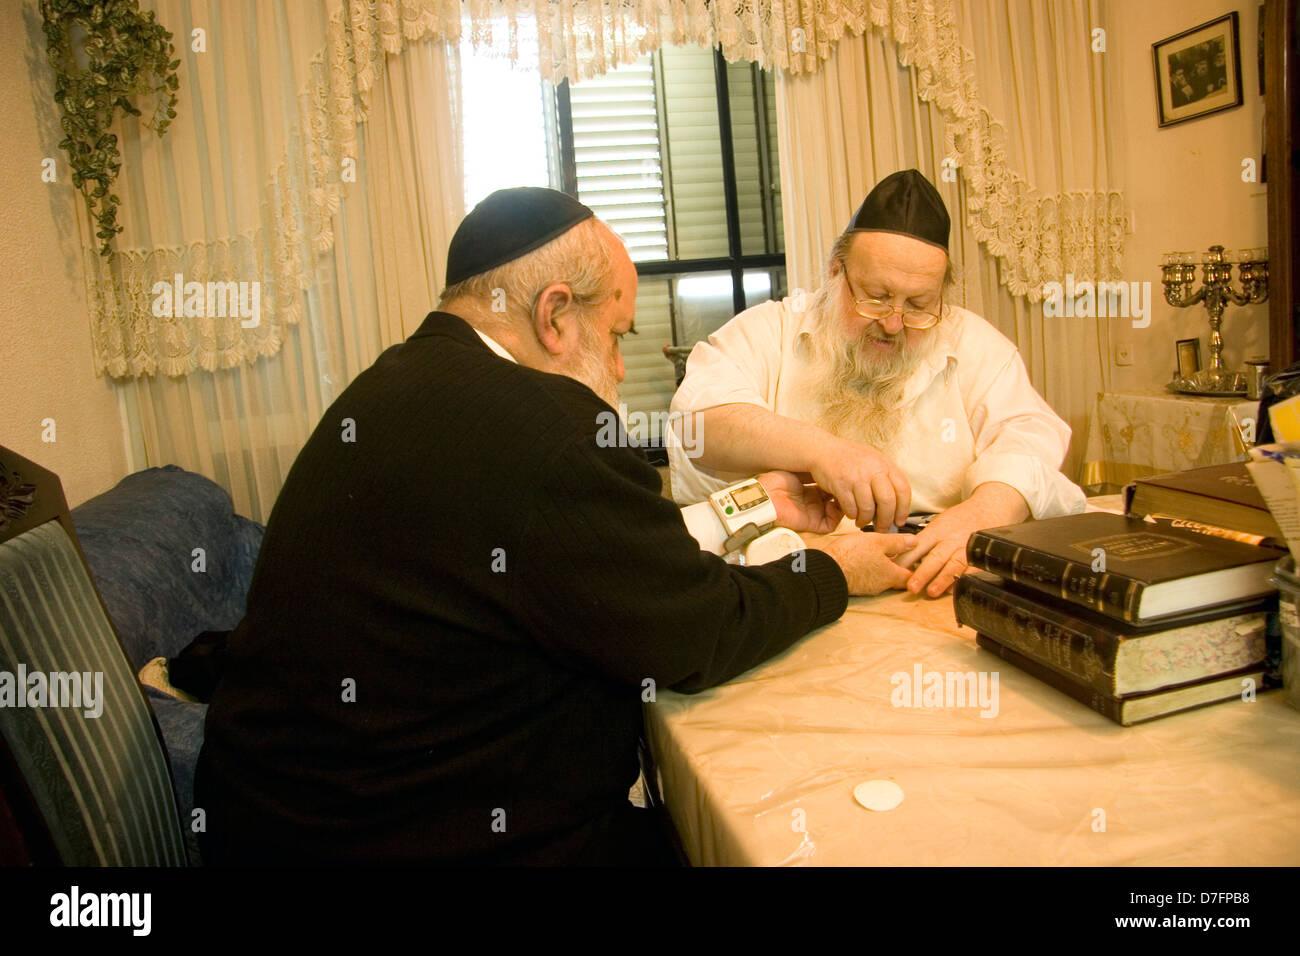 Rabbi Hezi Elenberg of Ger Hasidic dynasty practising Alternative Medicine in Bnei Brak , Israel - Stock Image